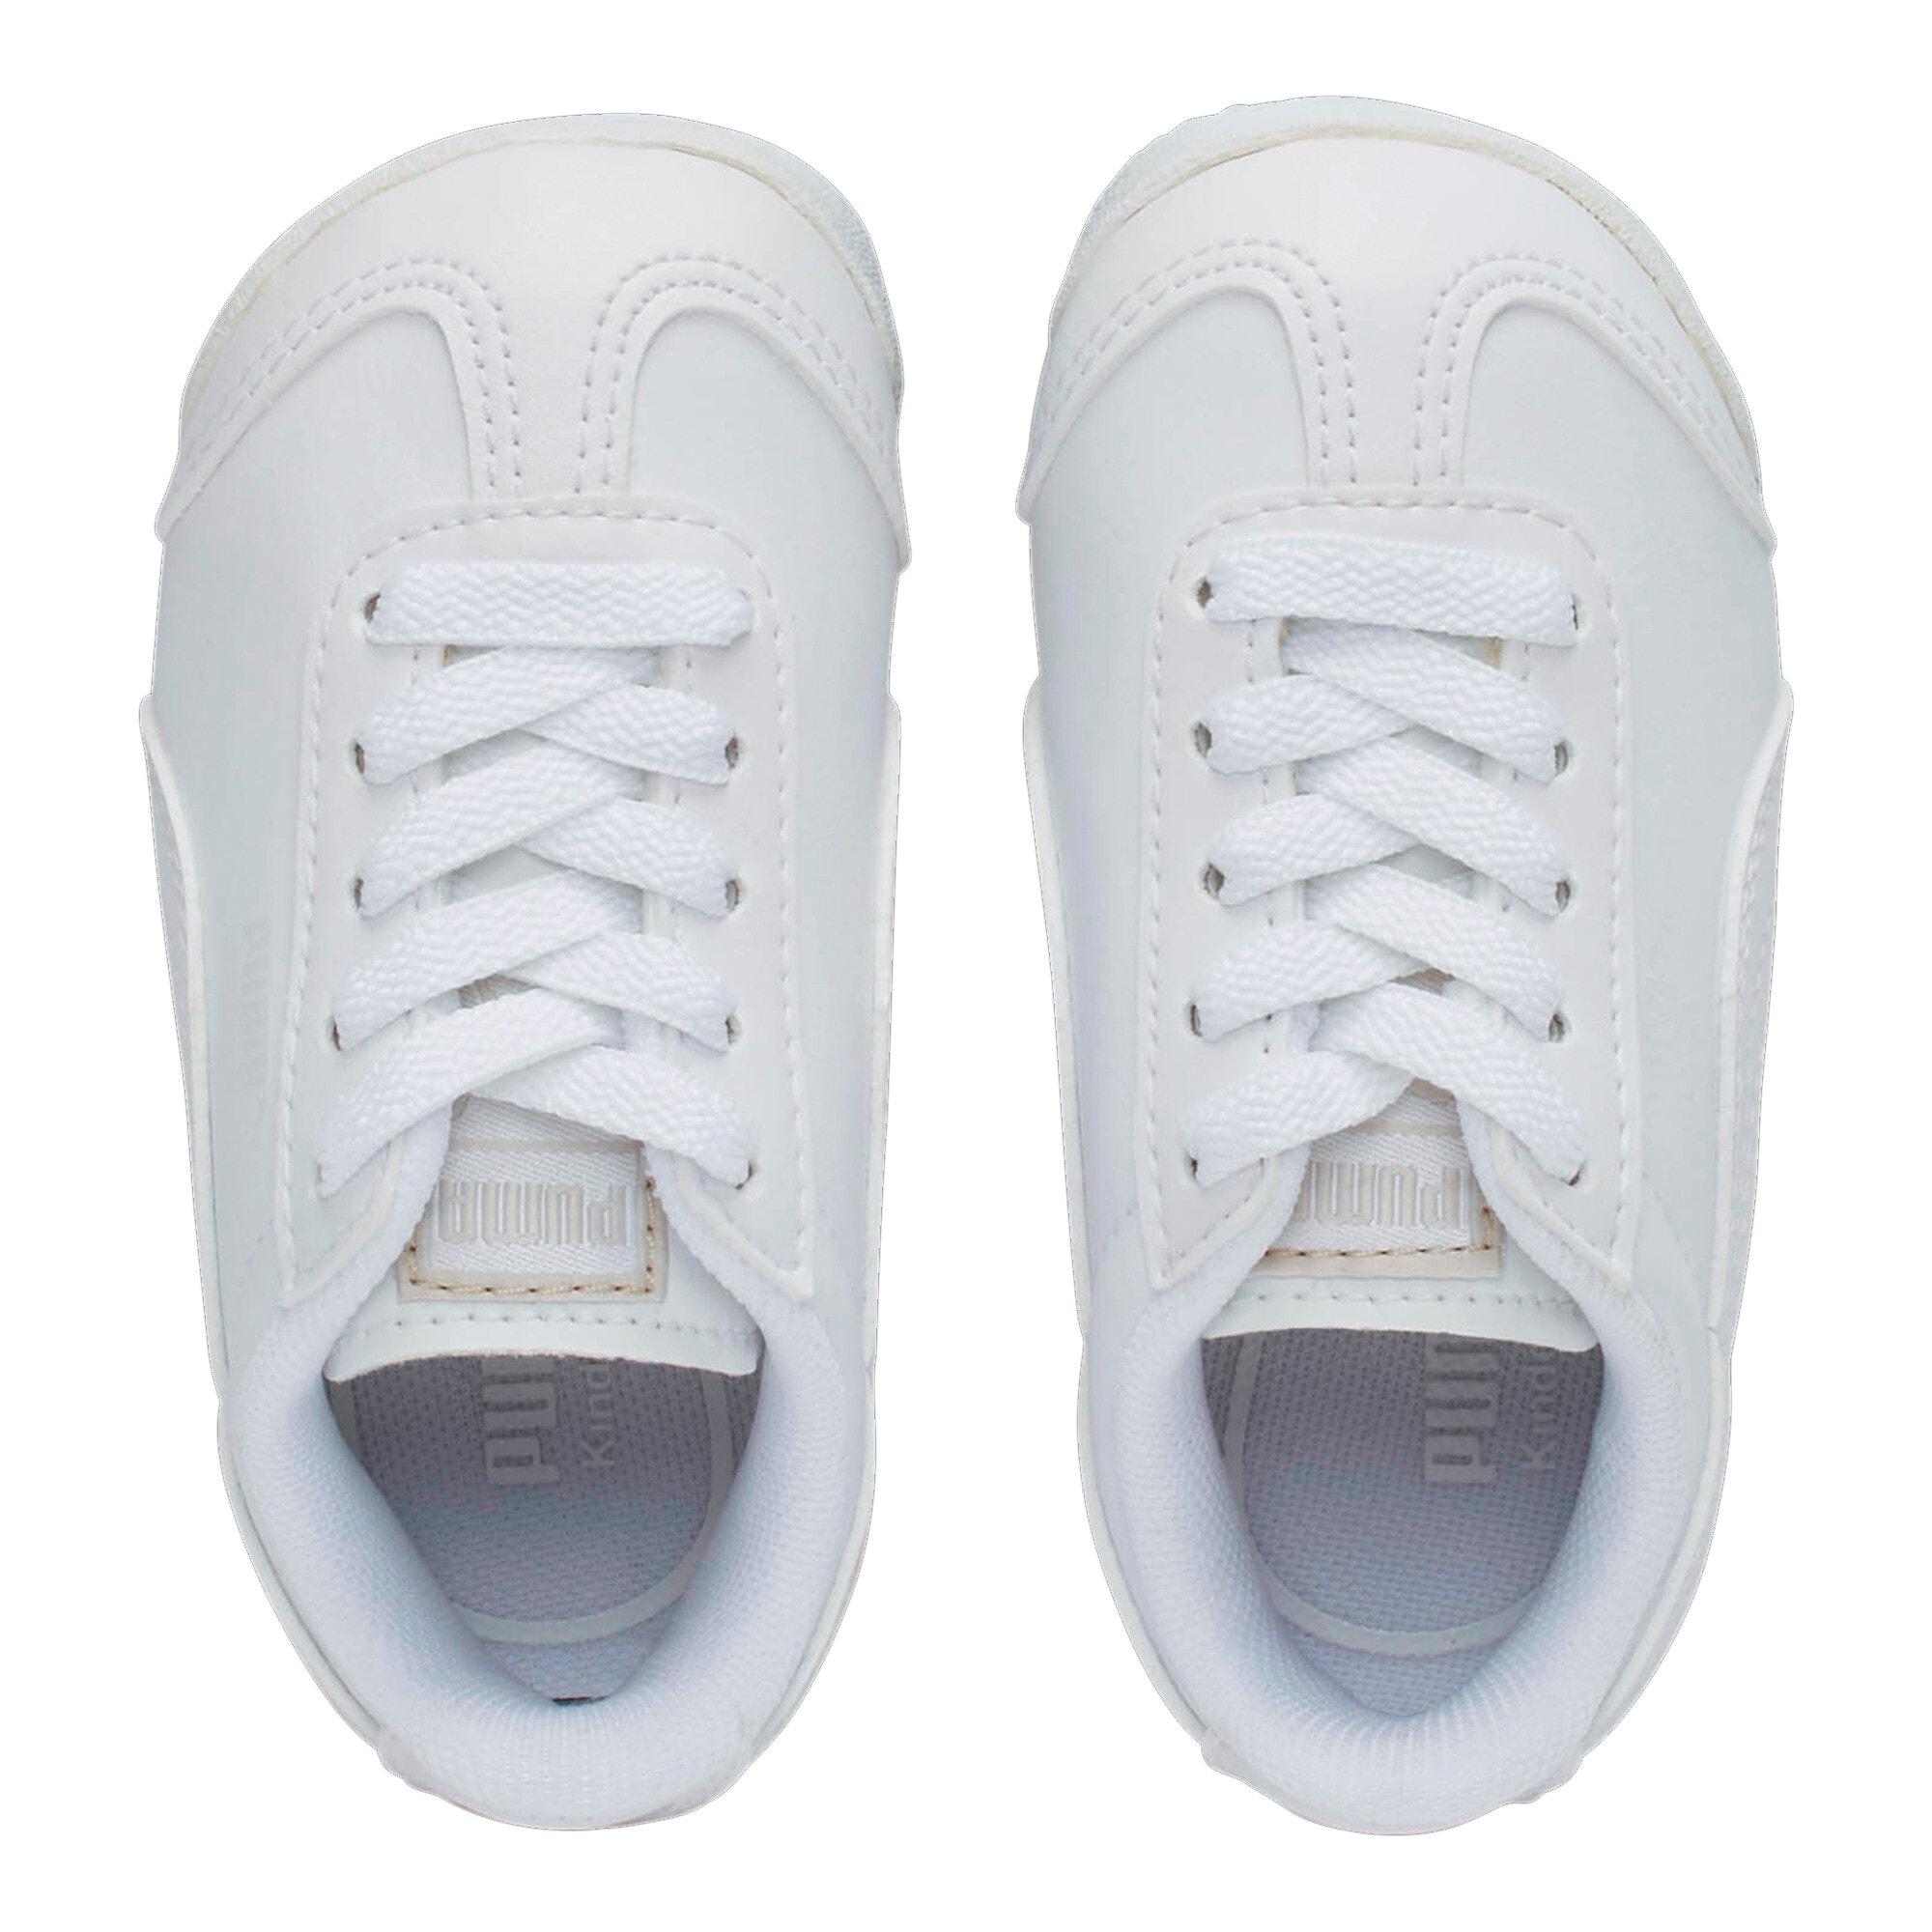 Thumbnail 6 of Roma Basic Toddler Shoes, white-light gray, medium